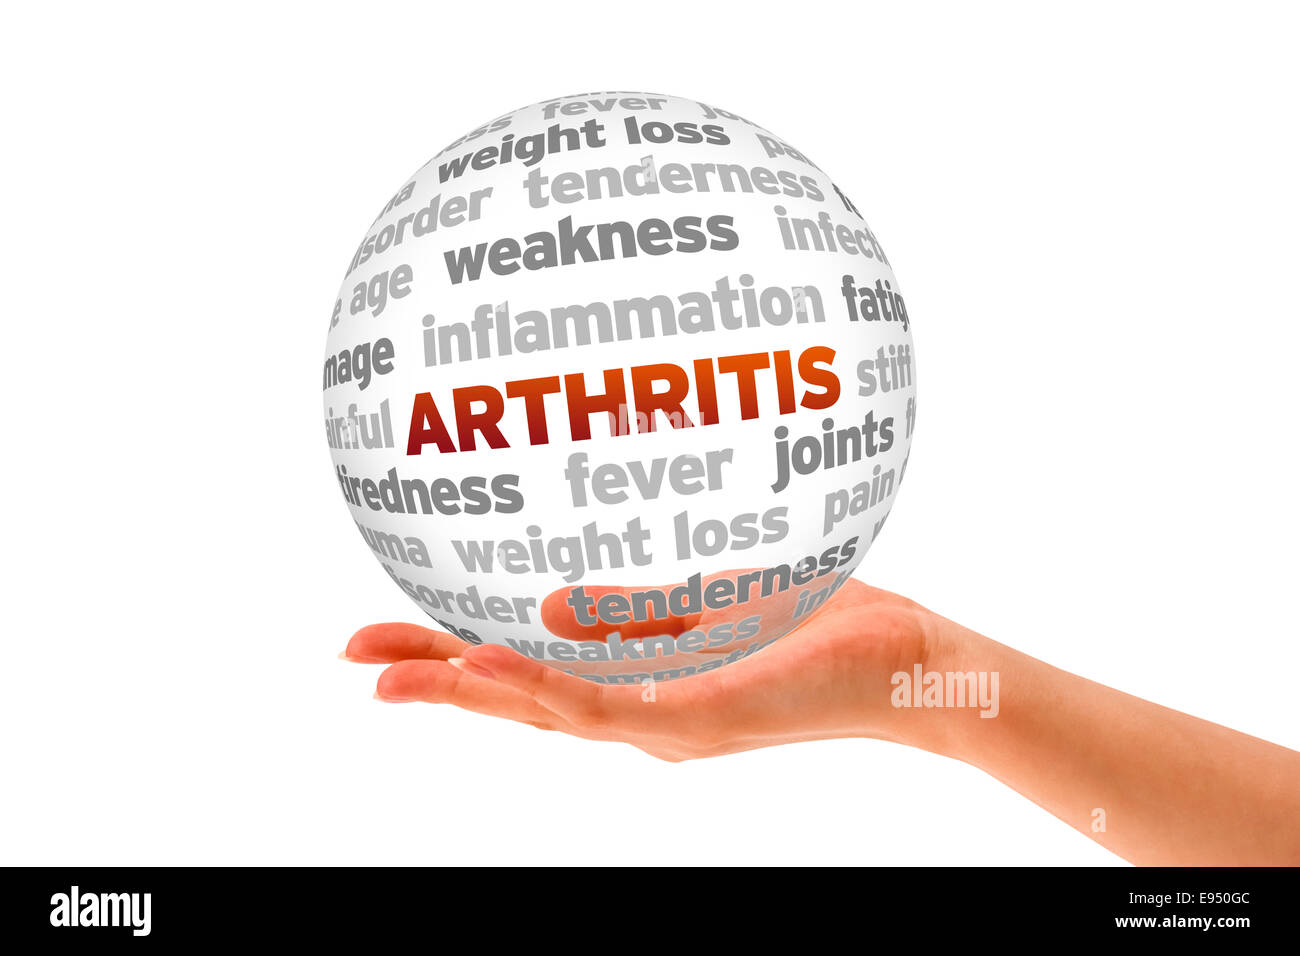 Arthritis - Stock Image